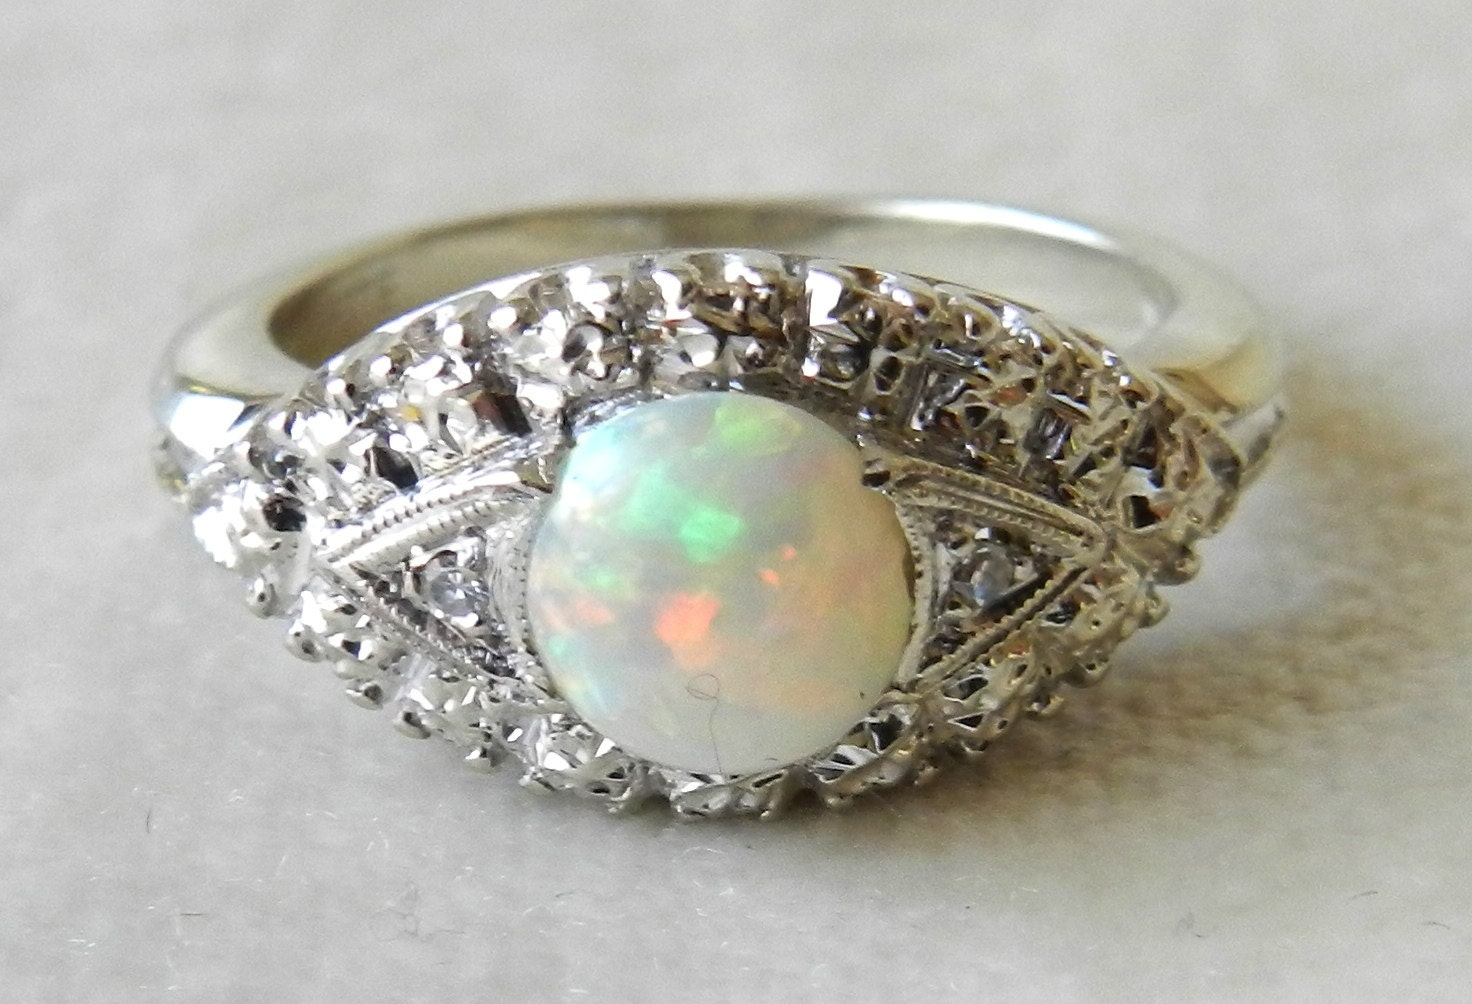 opal engagement ring 14k white gold navette deco opal